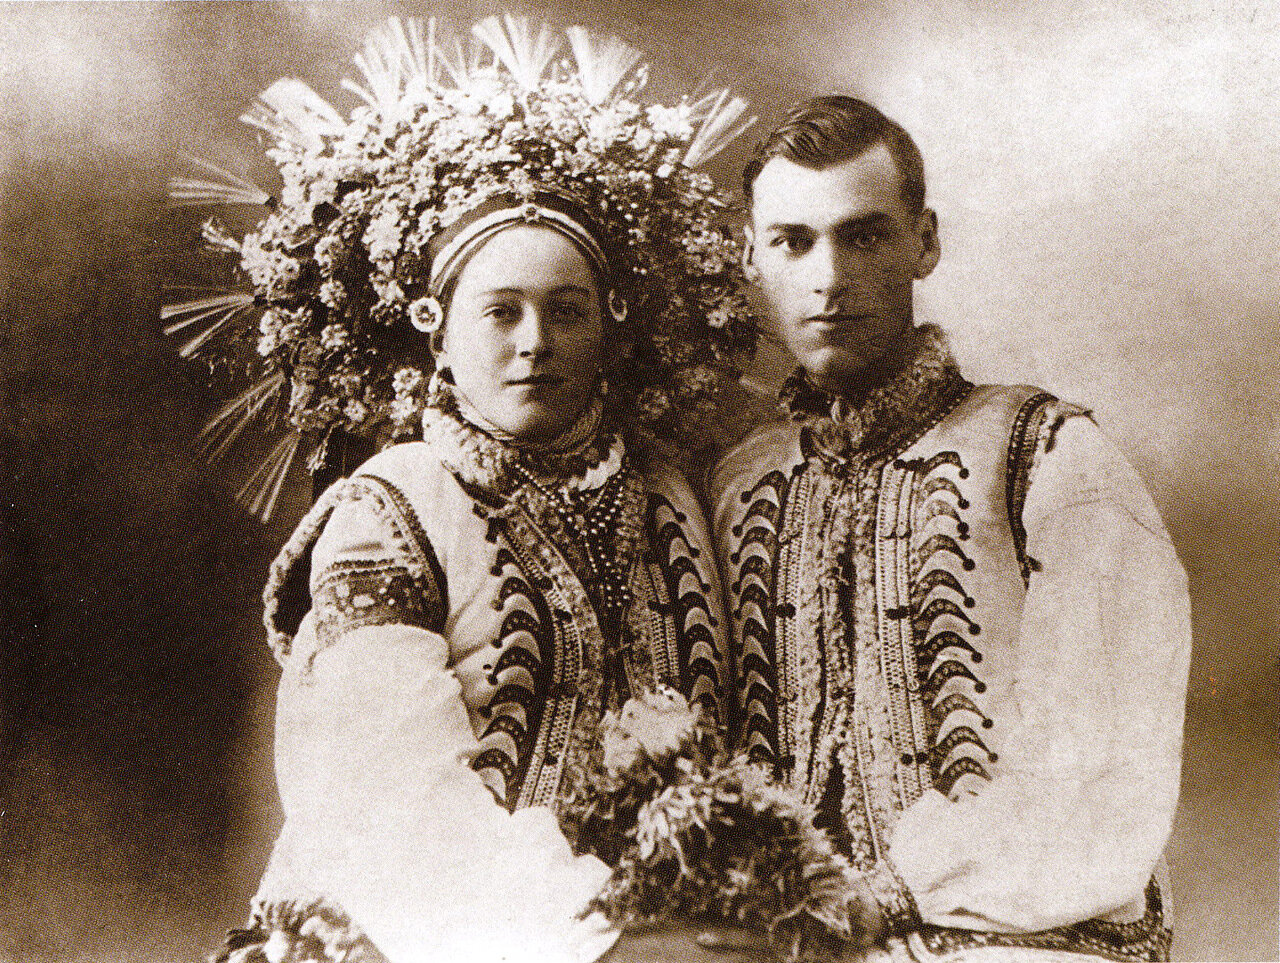 Свадебная пара. Село Космач Ивано-Франковской обл. 1920